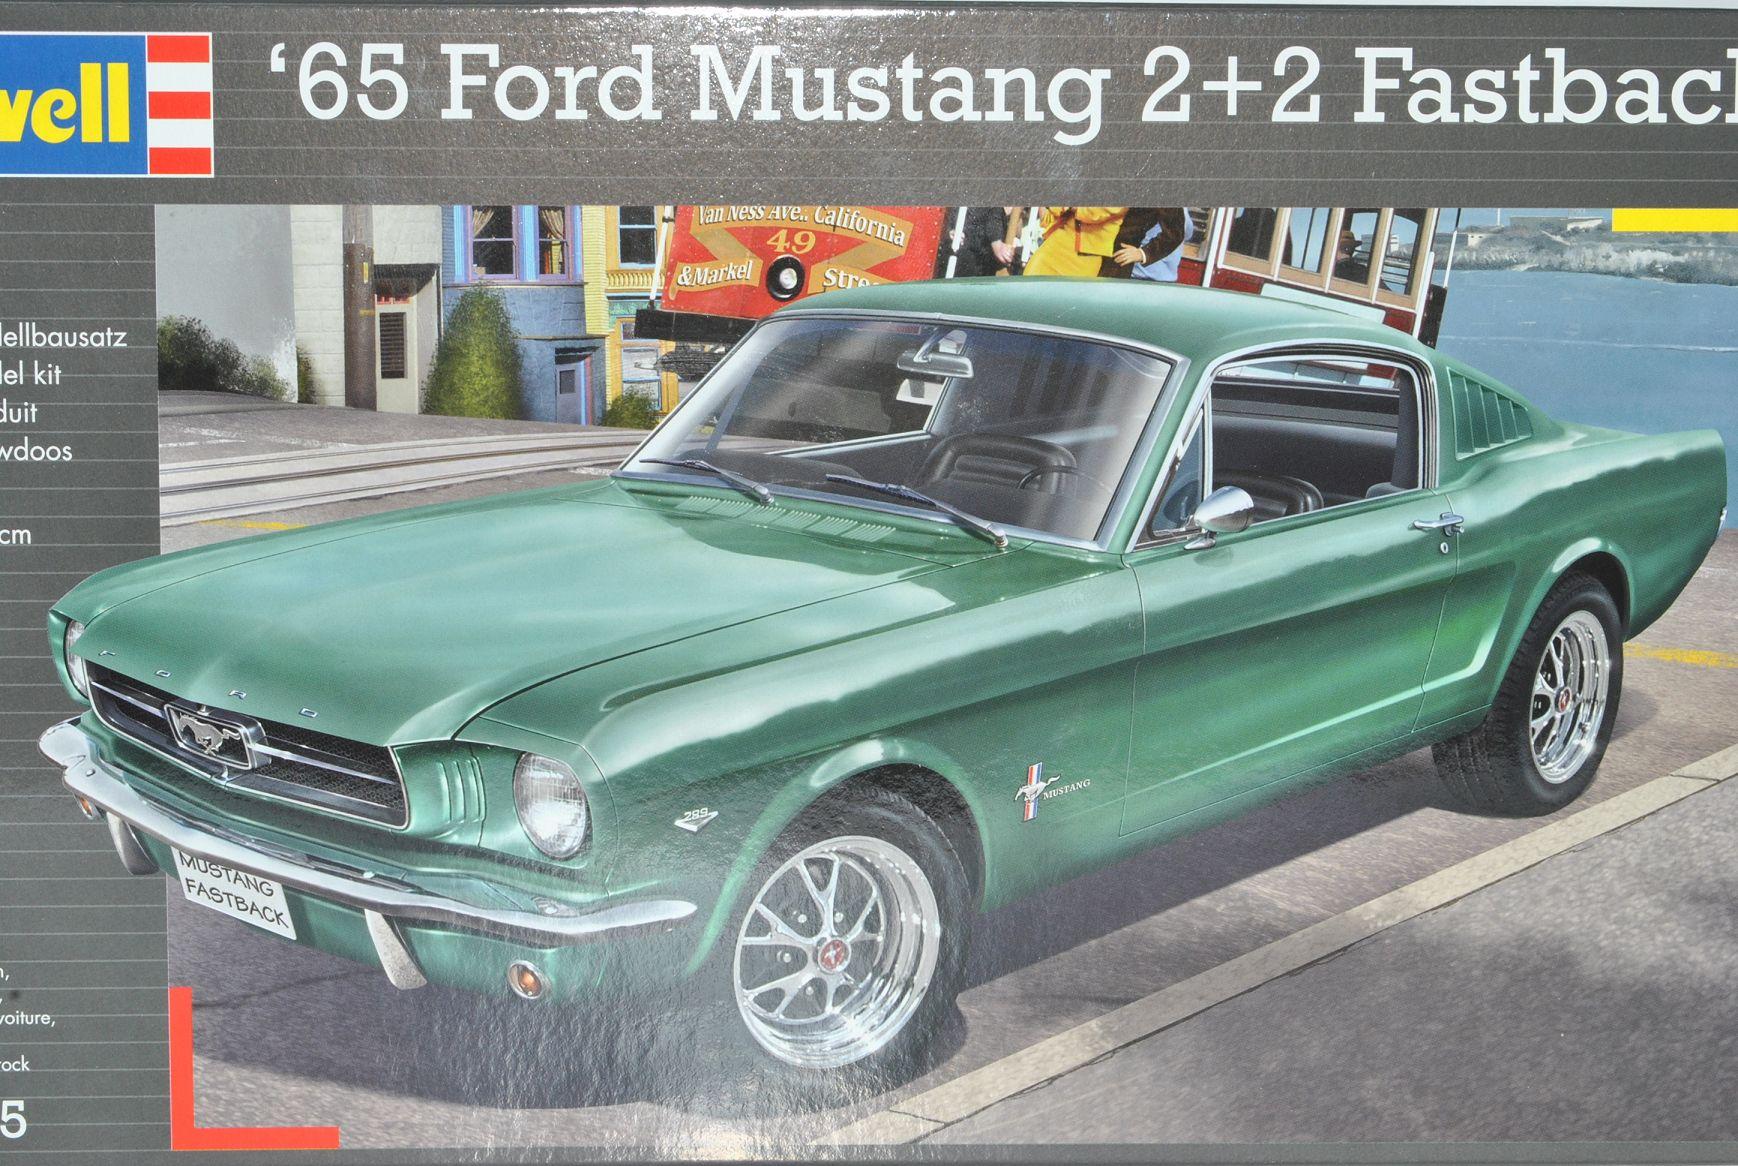 ford mustang coupe fastback 2 2 1965 07065 bausatz kit 1. Black Bedroom Furniture Sets. Home Design Ideas